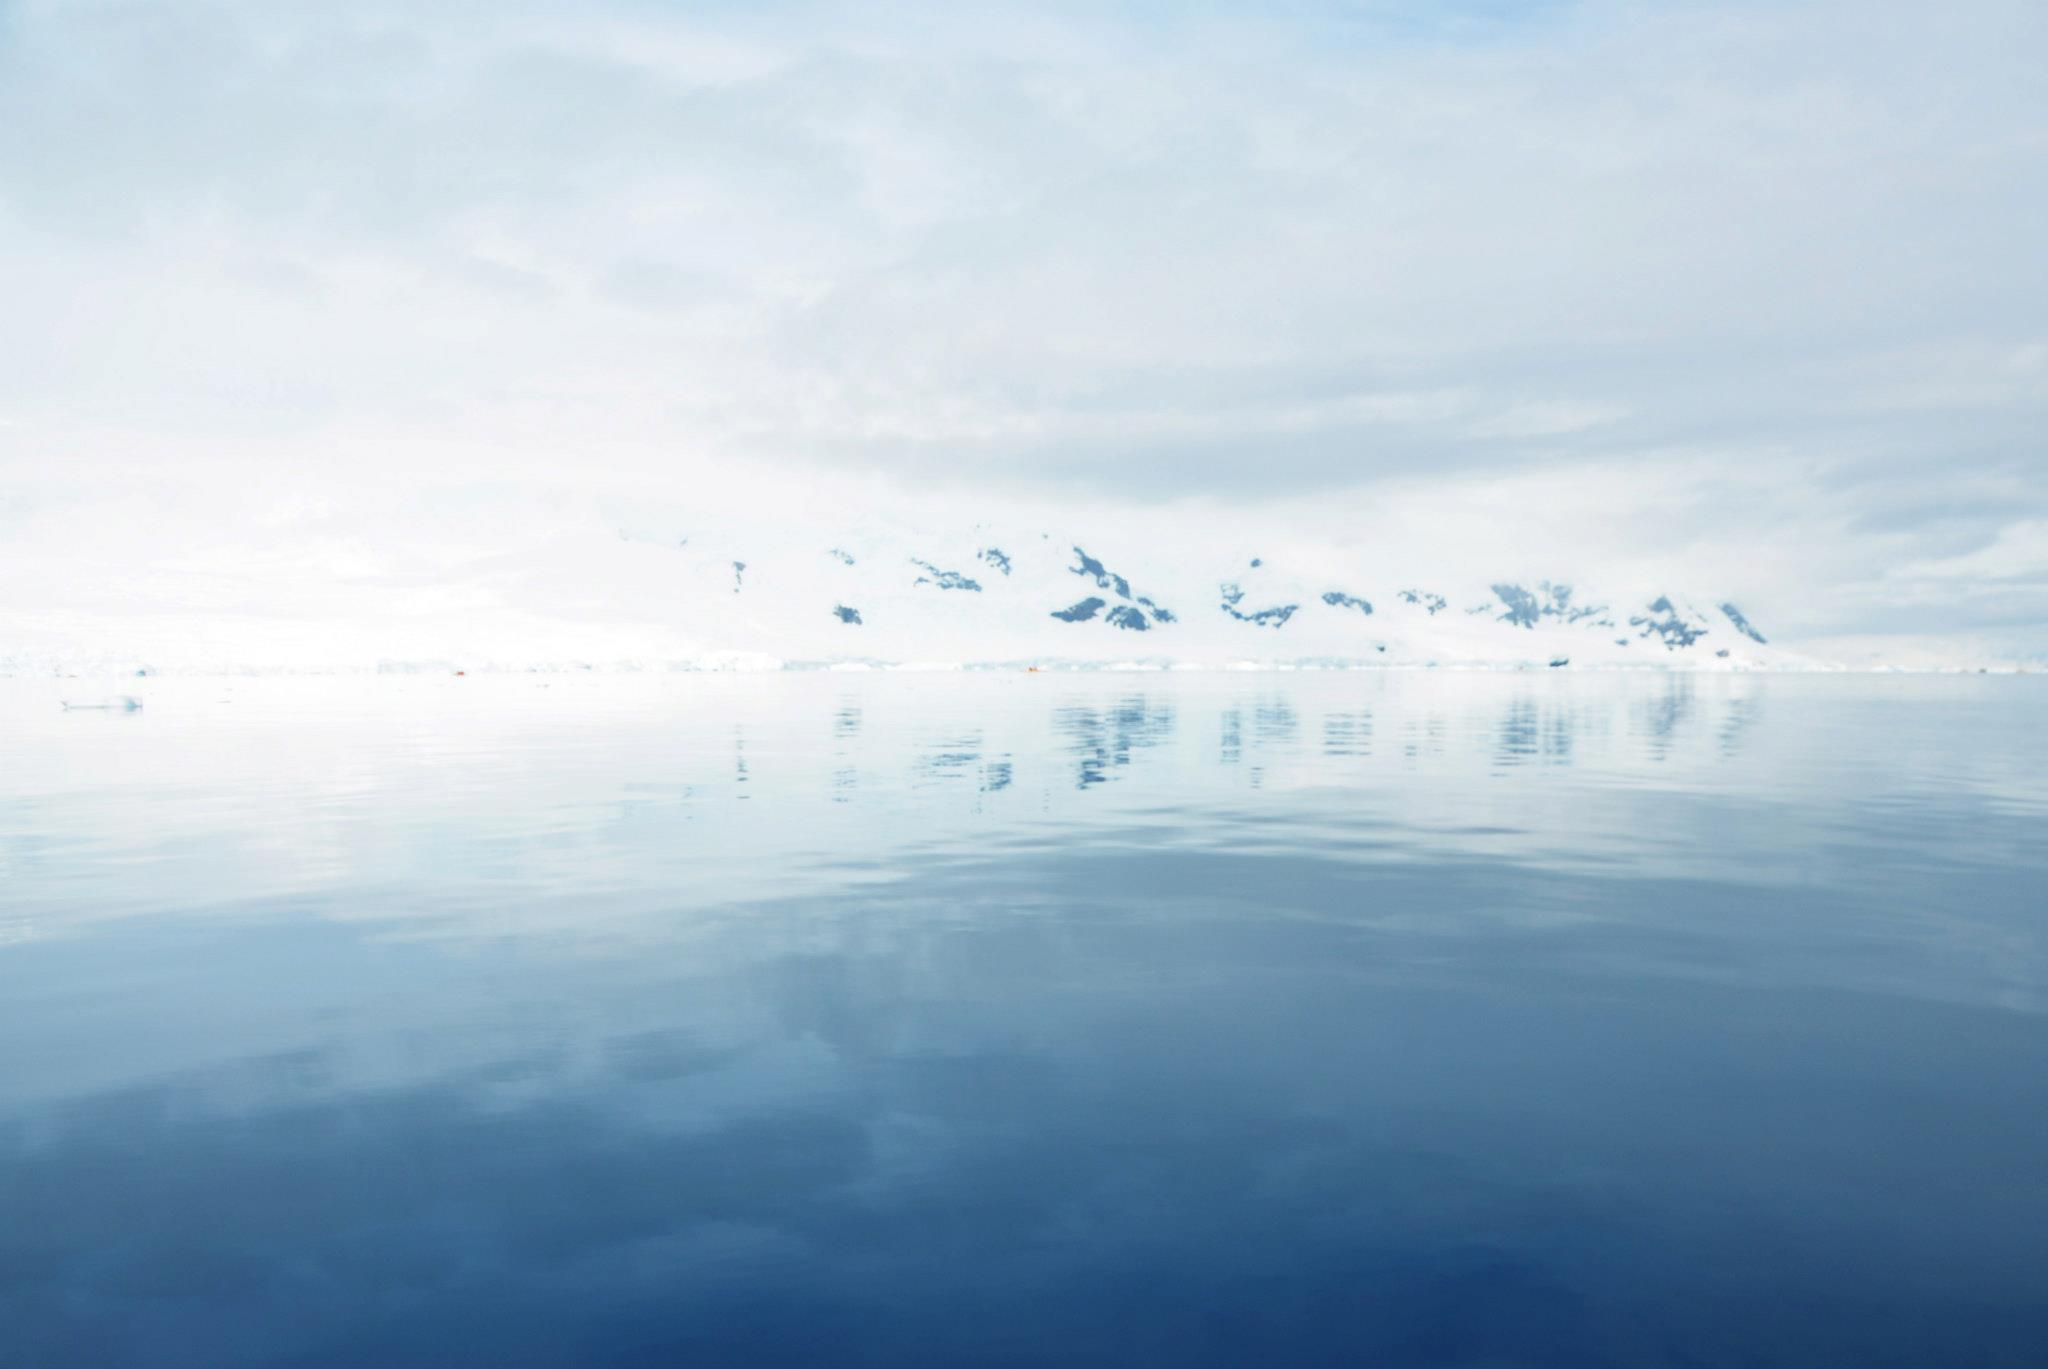 Antarctica, December 2012